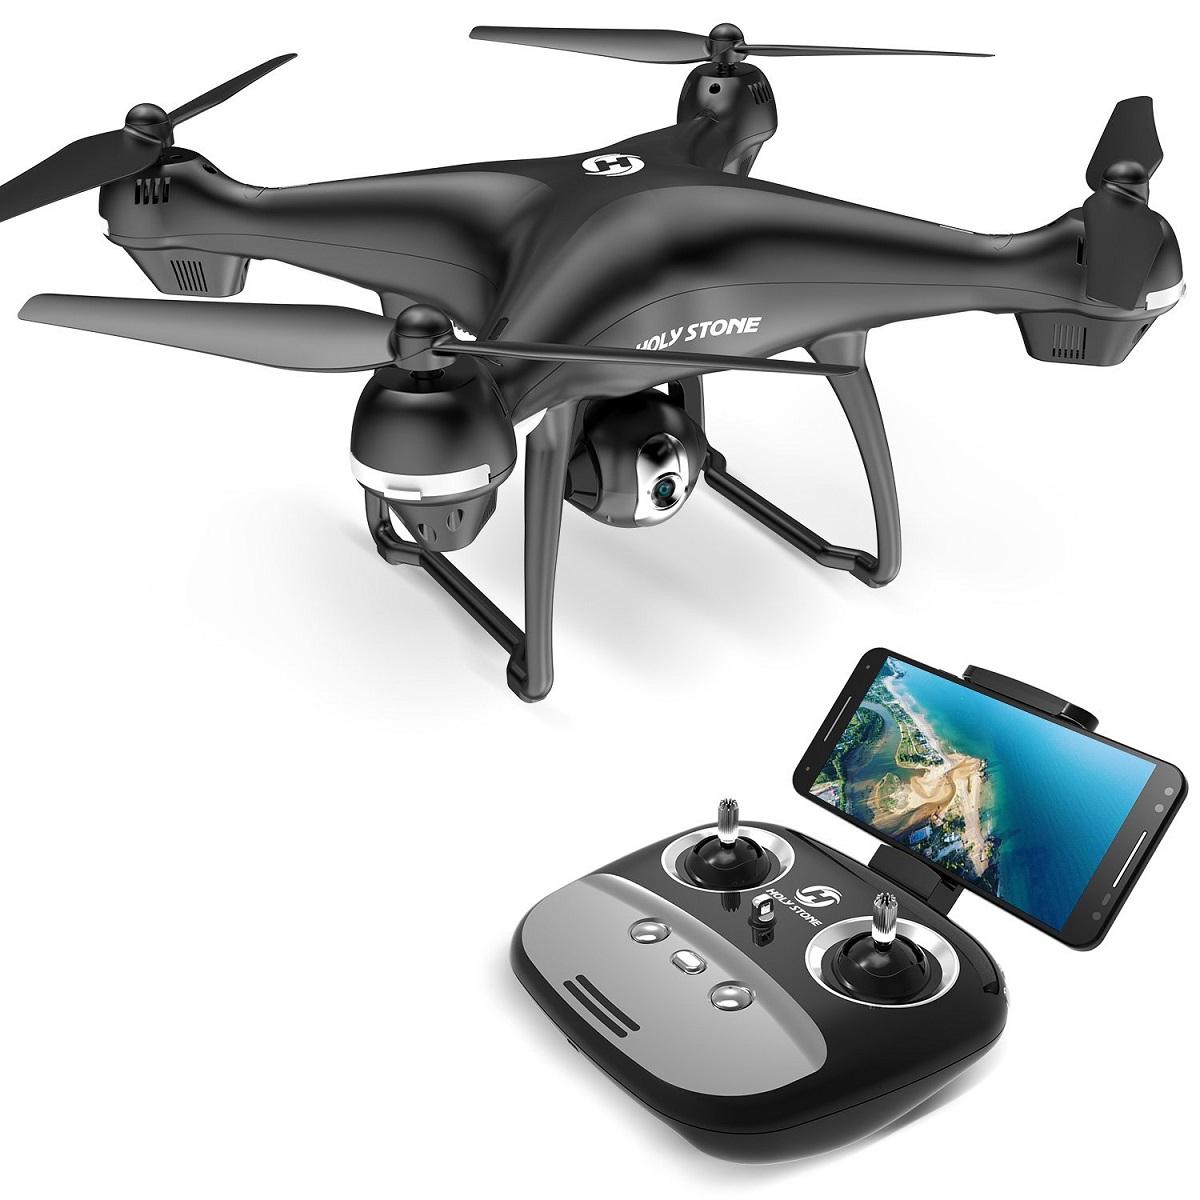 Holy Stone ドローン GPS搭載 1080P広角HDカメラ付き フォローミーモード オートリターンモード 操縦可能距離500M 生中継最大距離400M 画像遅延が無い 最大飛行時間15分 高度維持 モード1/2自由転換可 国内認証済み HS100G